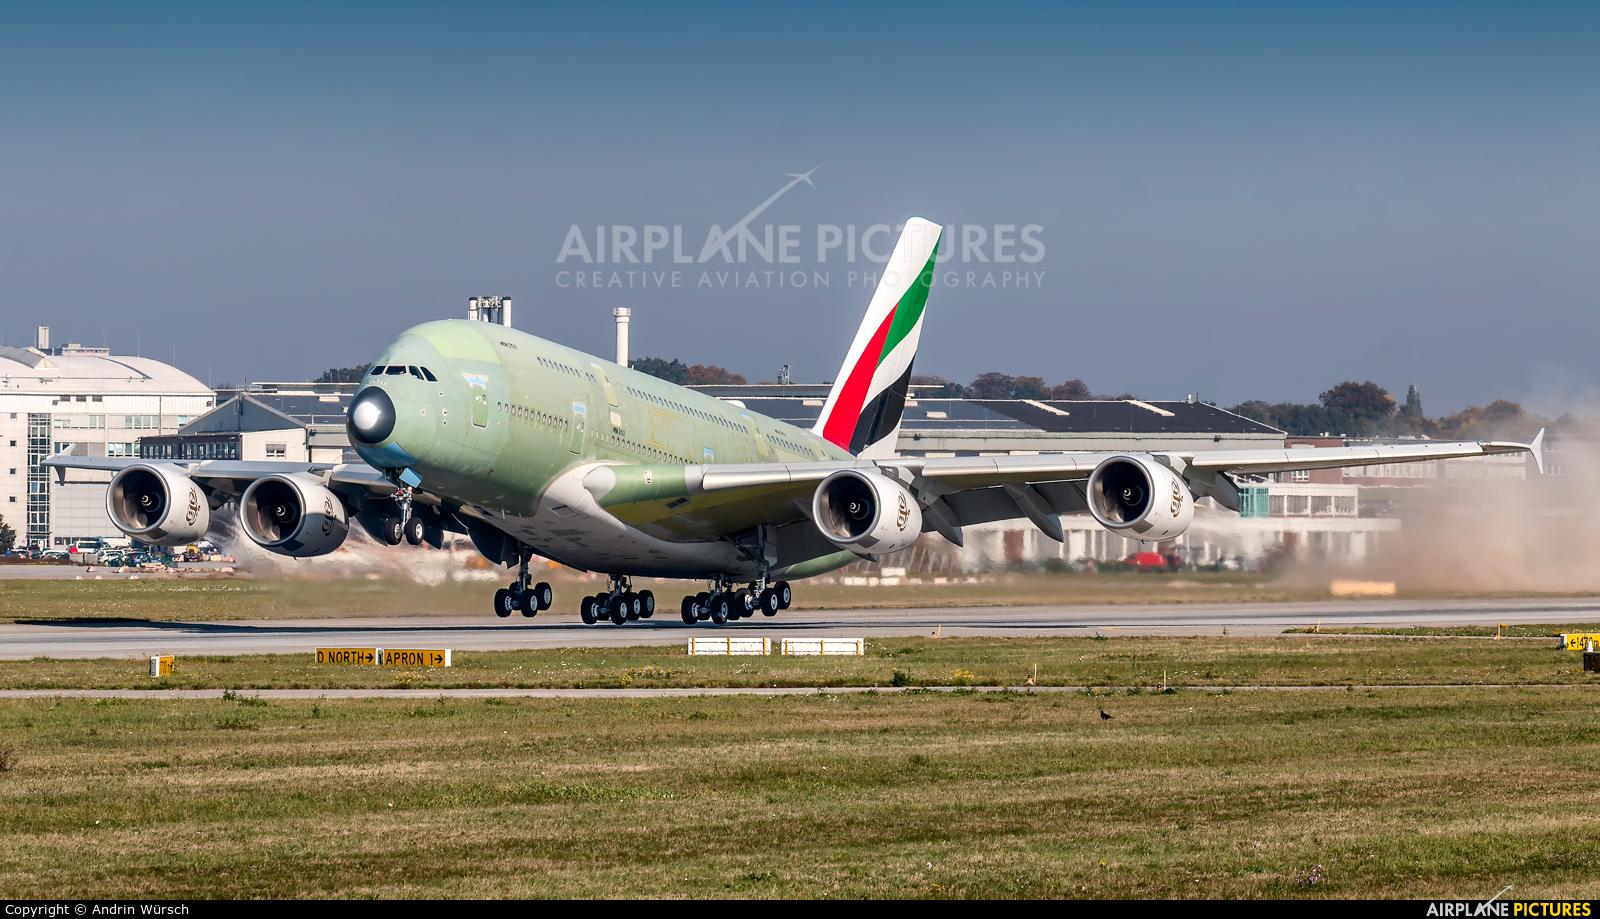 Emirates Airlines F-WWSY aircraft at Hamburg - Finkenwerder